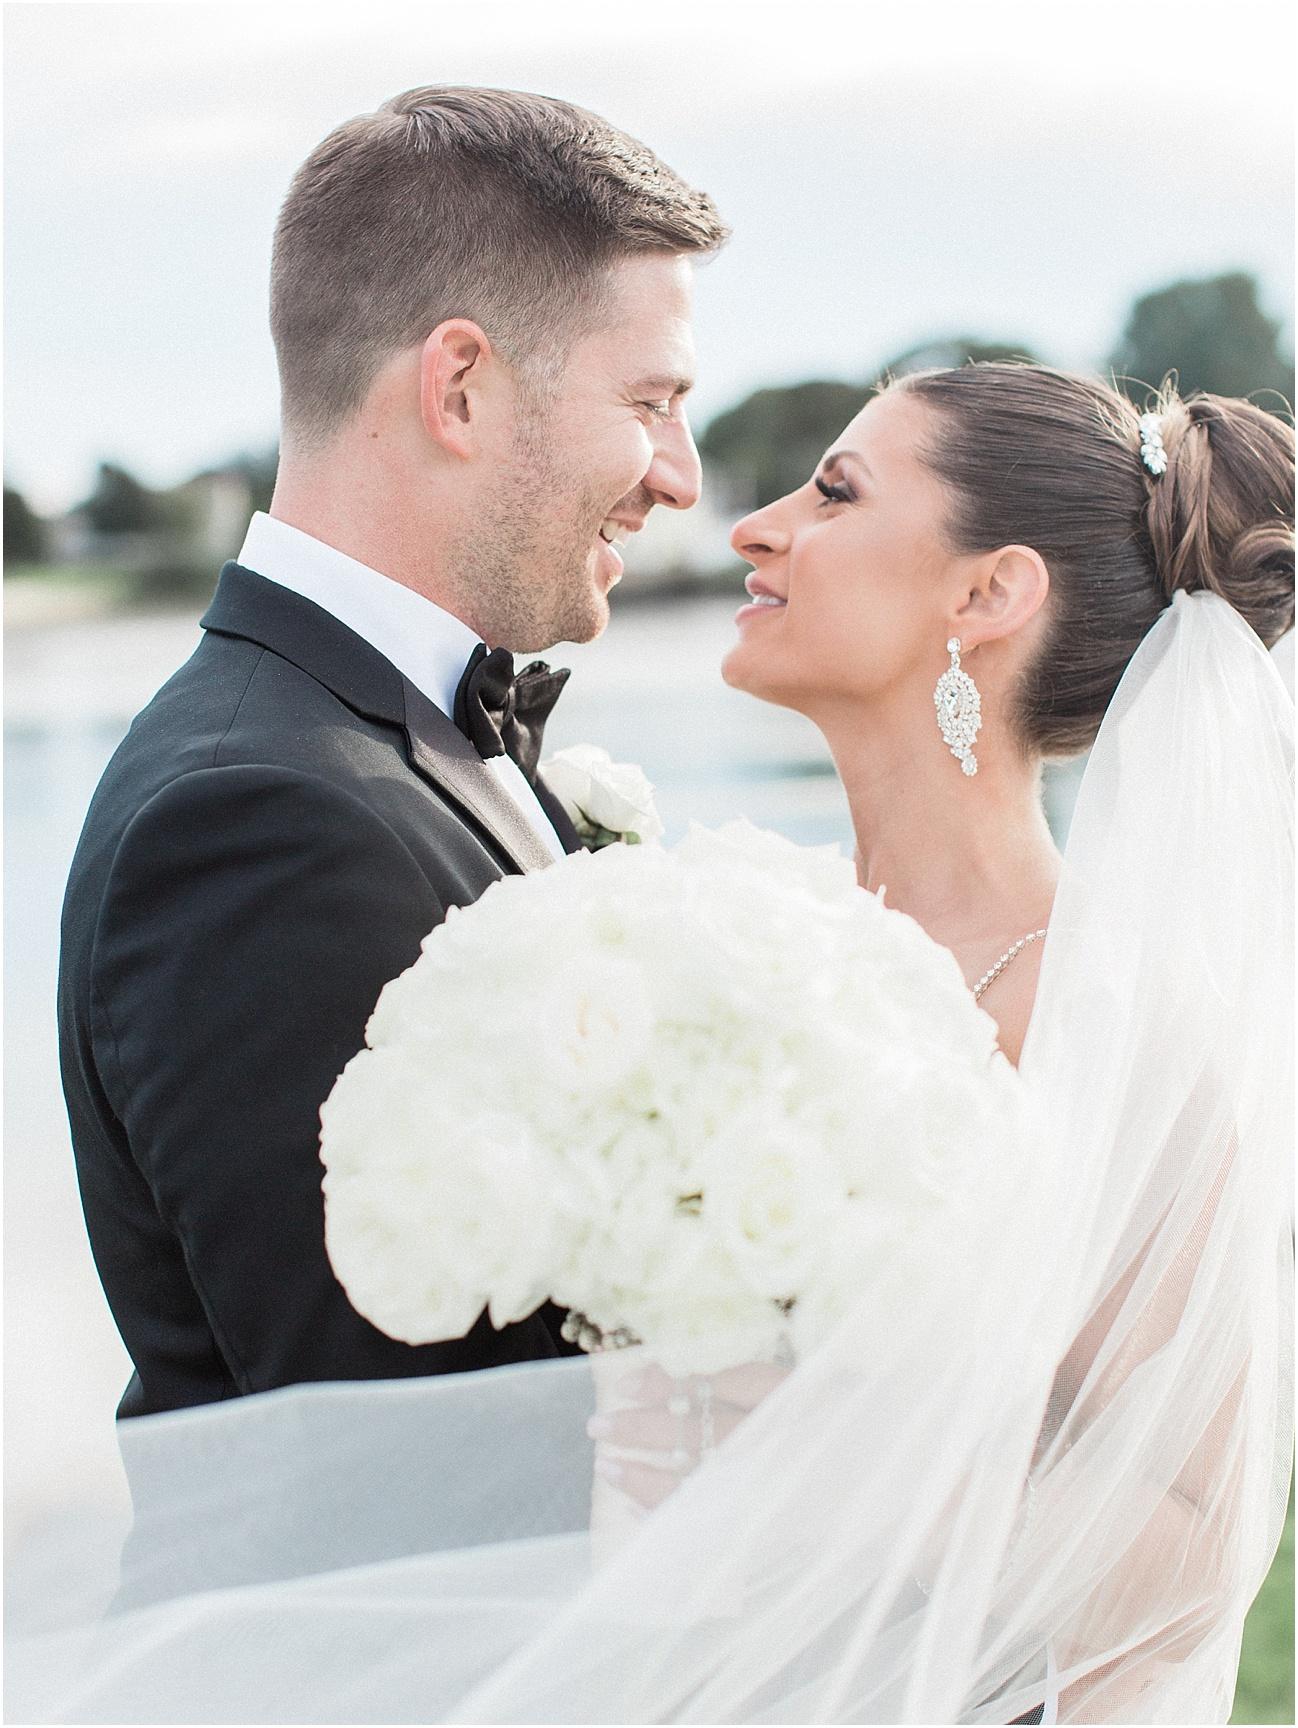 bianca_chris_danversport_italian_blush_gold_north_shore_cape_cod_boston_wedding_photographer_meredith_jane_photography_photo_1135.jpg